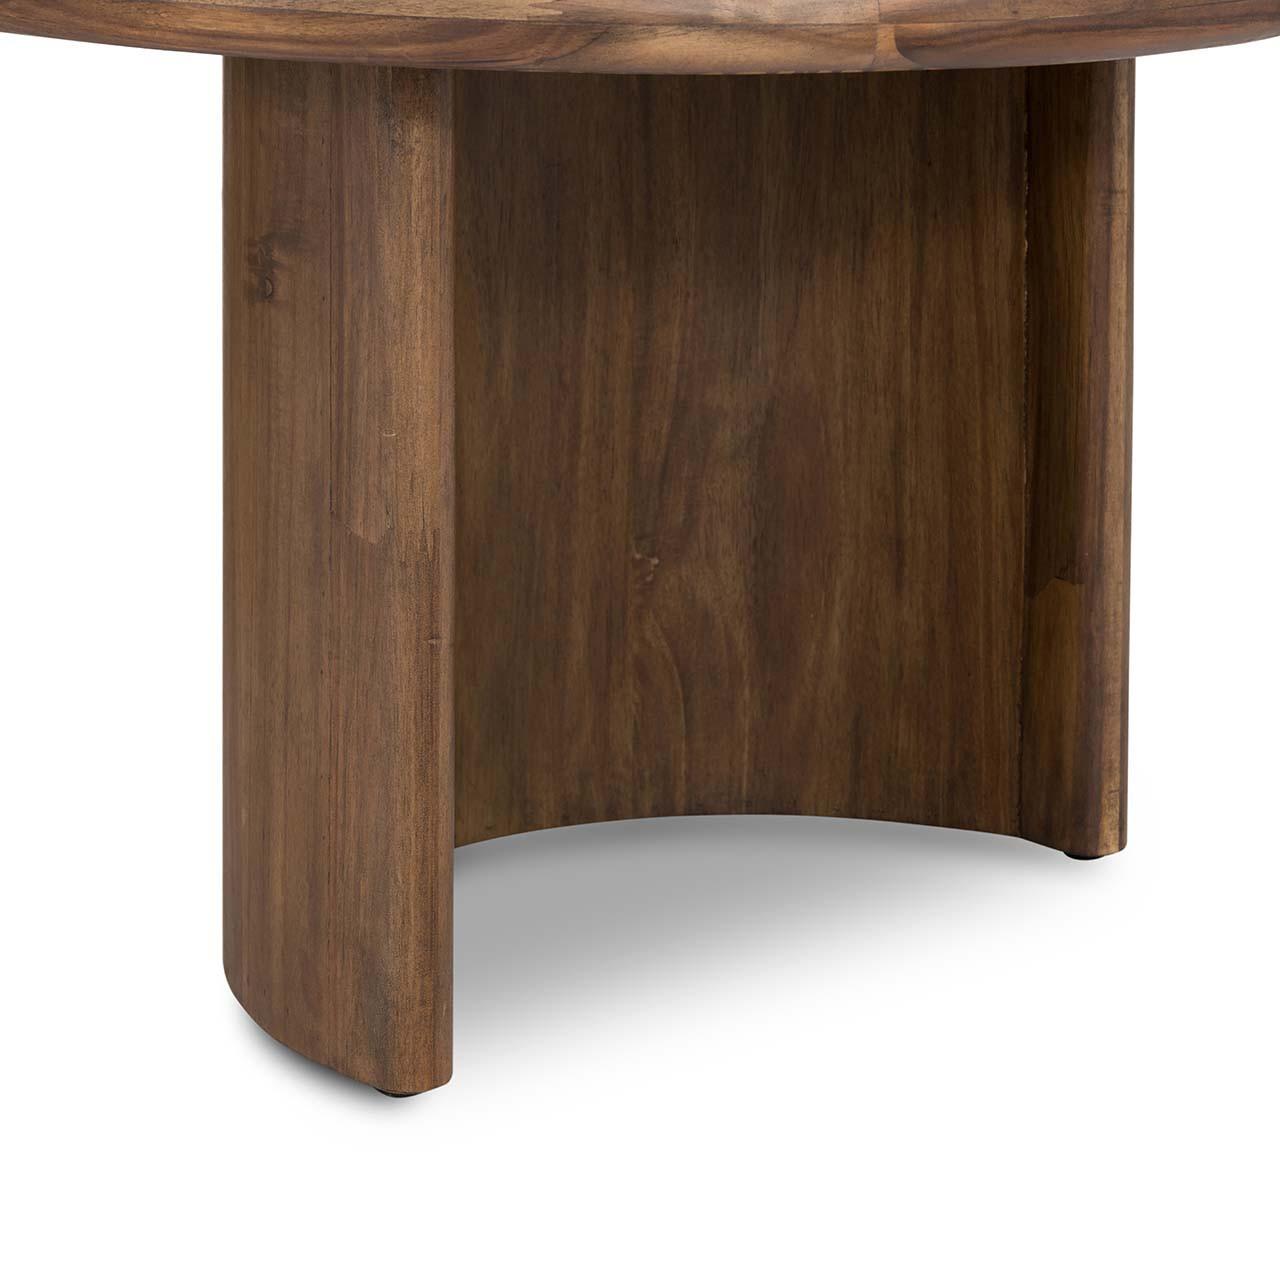 Gloder Coffee Table - Seasoned Brown Acacia